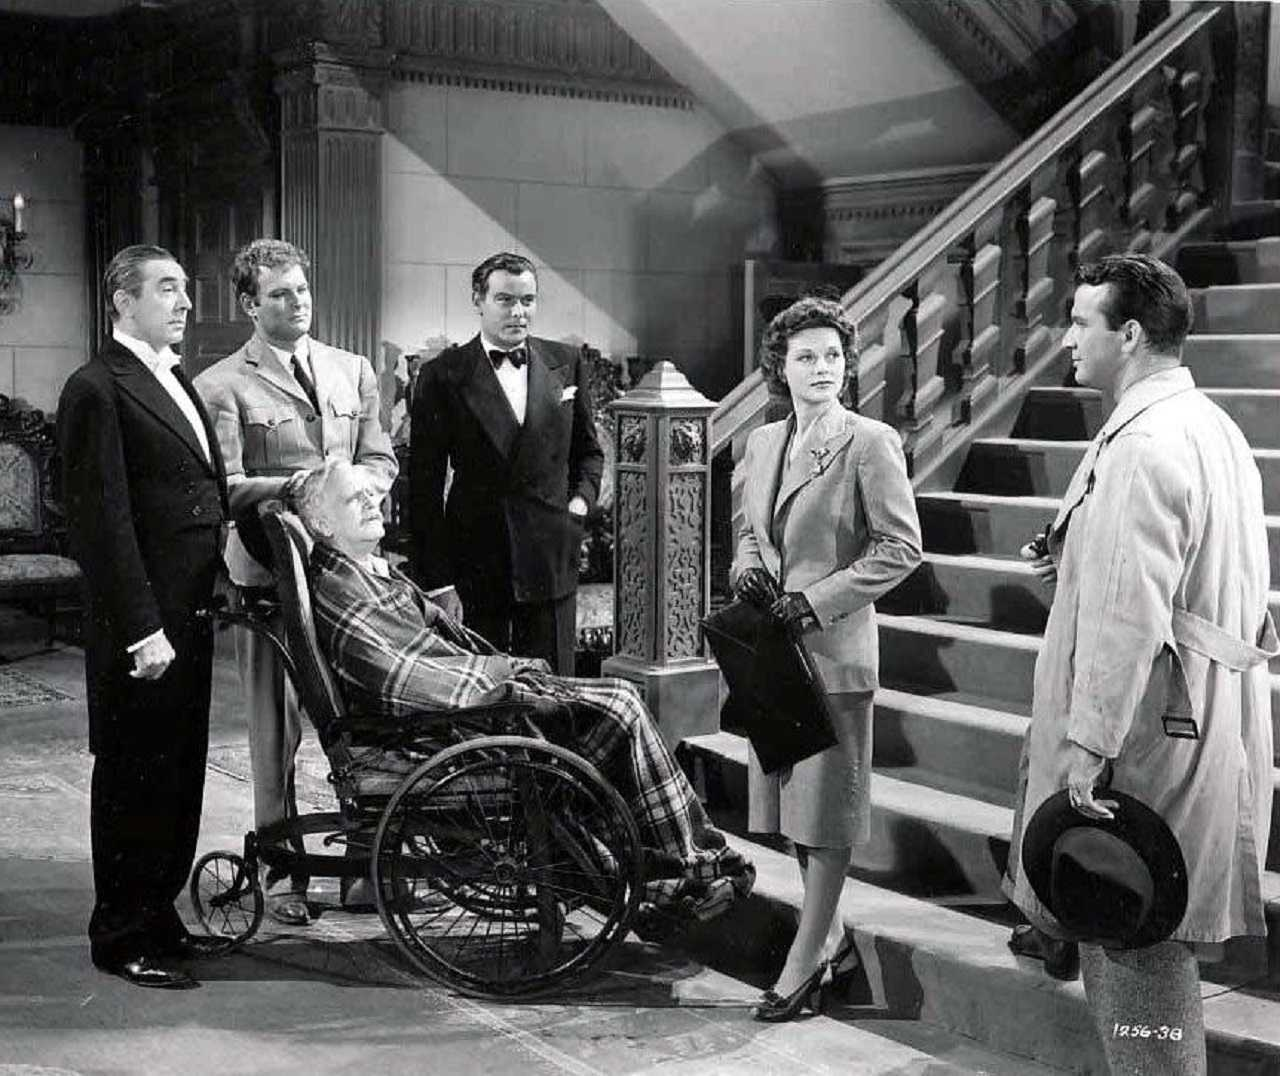 Bela Lugosi, Leif Erickson, Ralph Morgan, Nils Asther, Irene Hervey and Don Porter in Night Monster (1942)